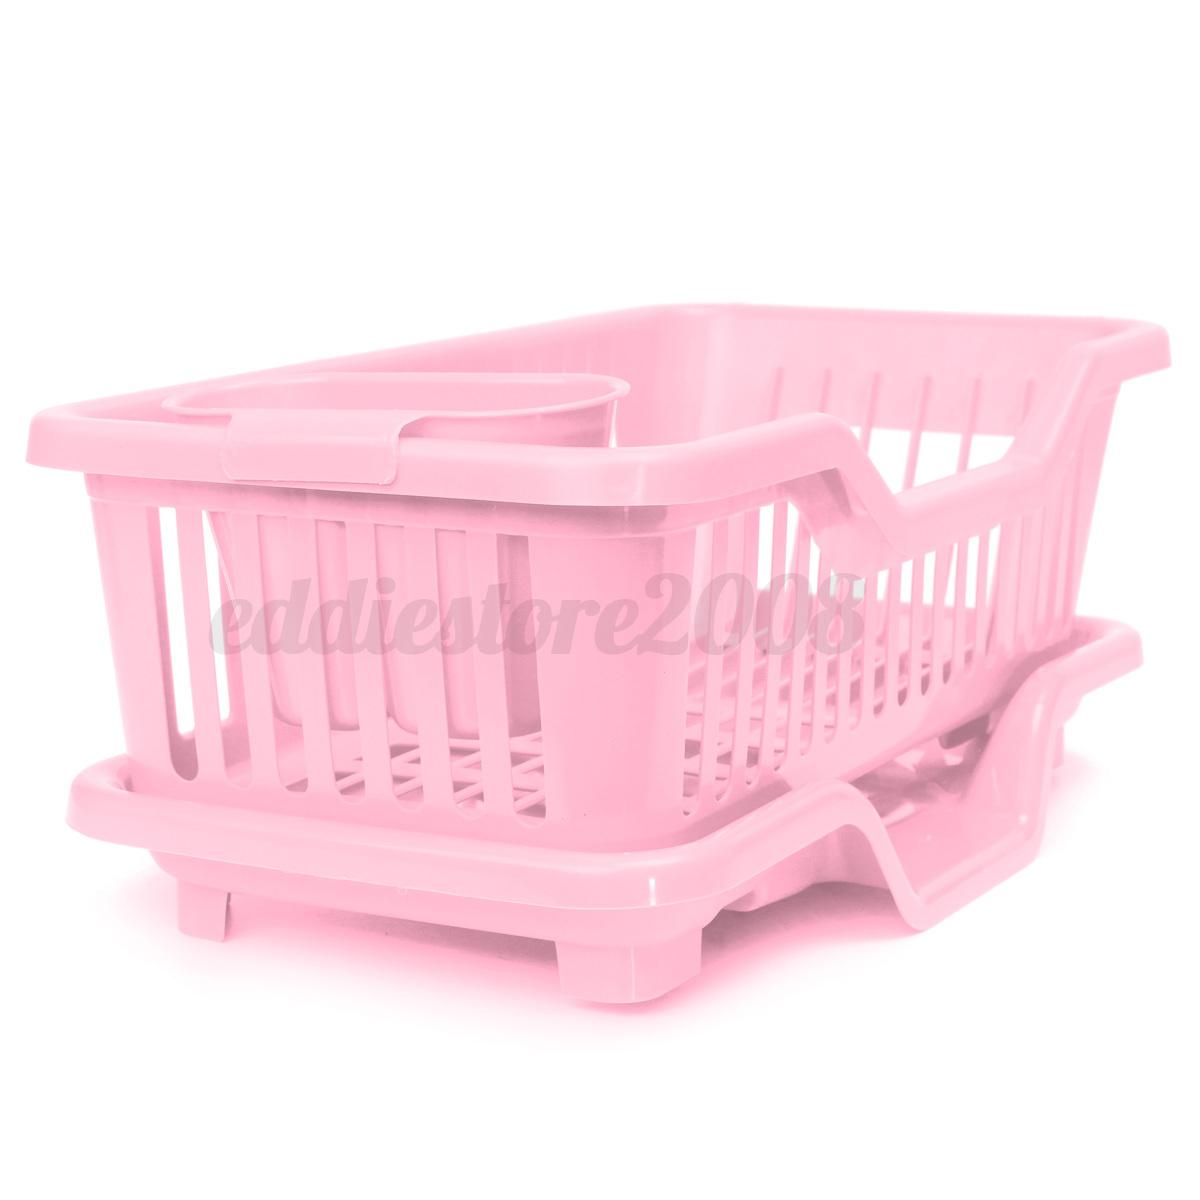 4 color kitchen sink dish drainer drying rack wash holder basket organizer tray ebay - Kitchen sink drying rack ...